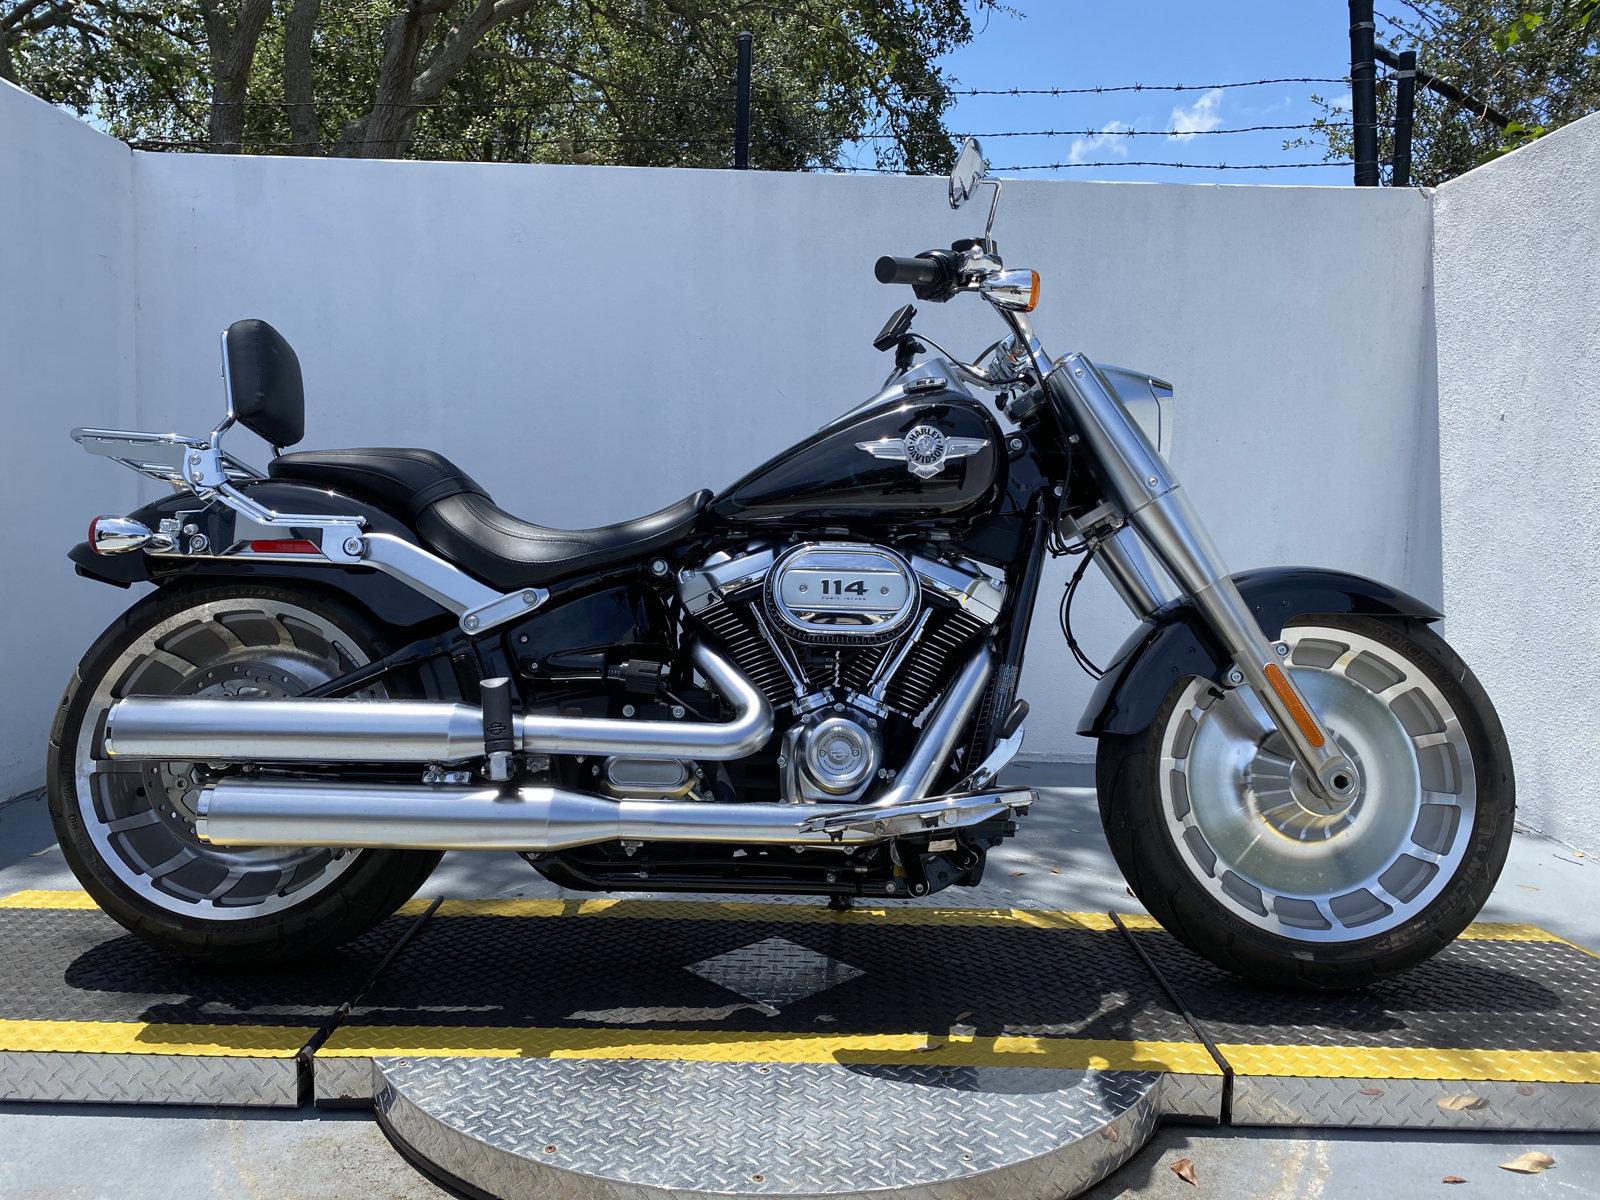 Pre-Owned 2020 Harley-Davidson Softail Fat Boy 114 FLFBS